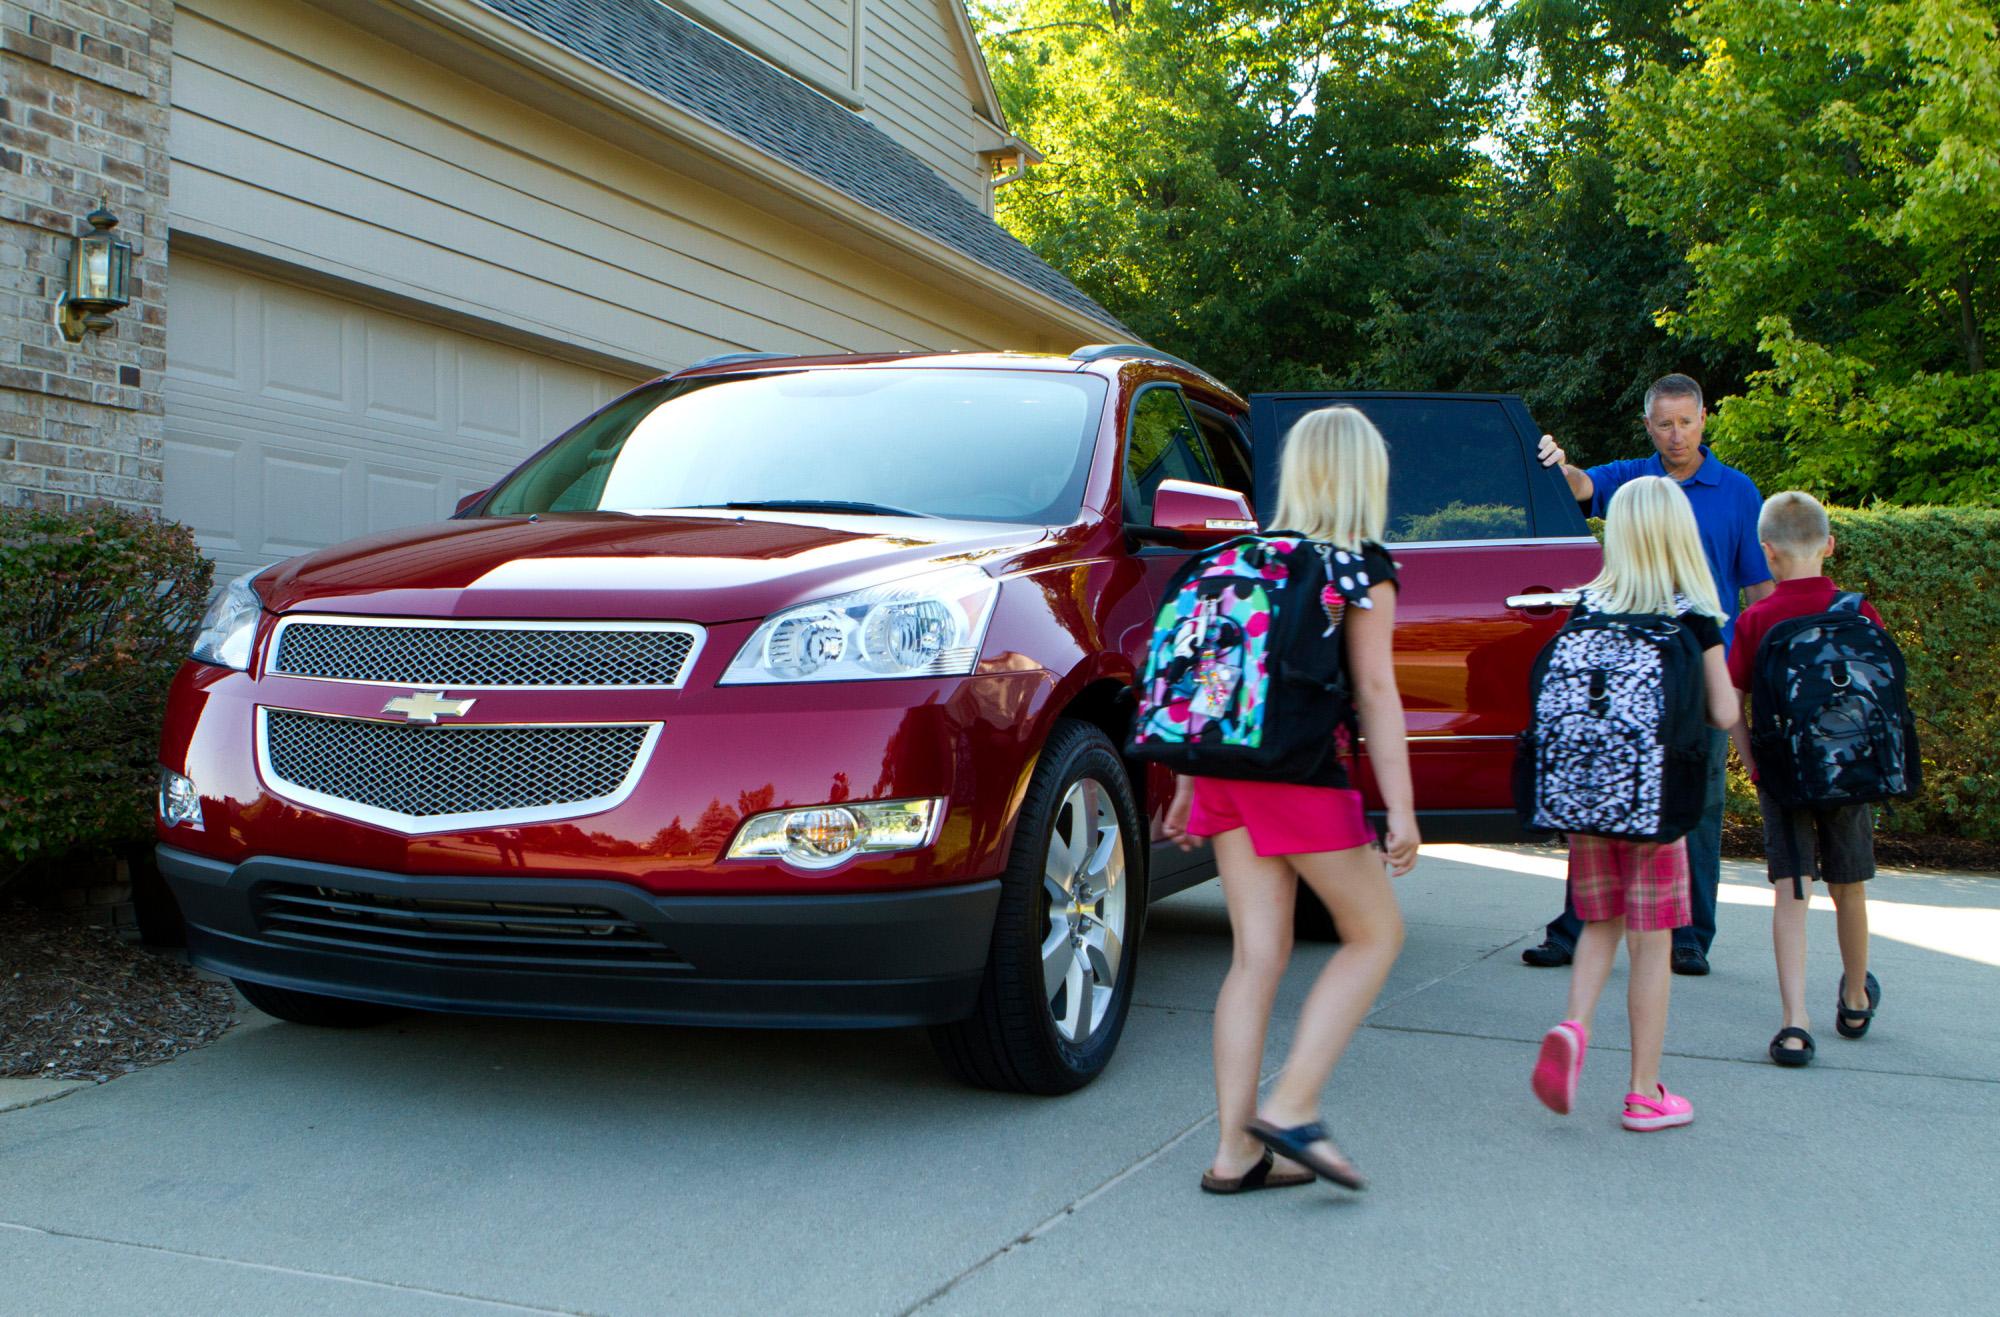 Five Star Auto Sales >> Chevrolet Survey Reveals the Soccer Dad, Recommends 2012 Traverse - autoevolution